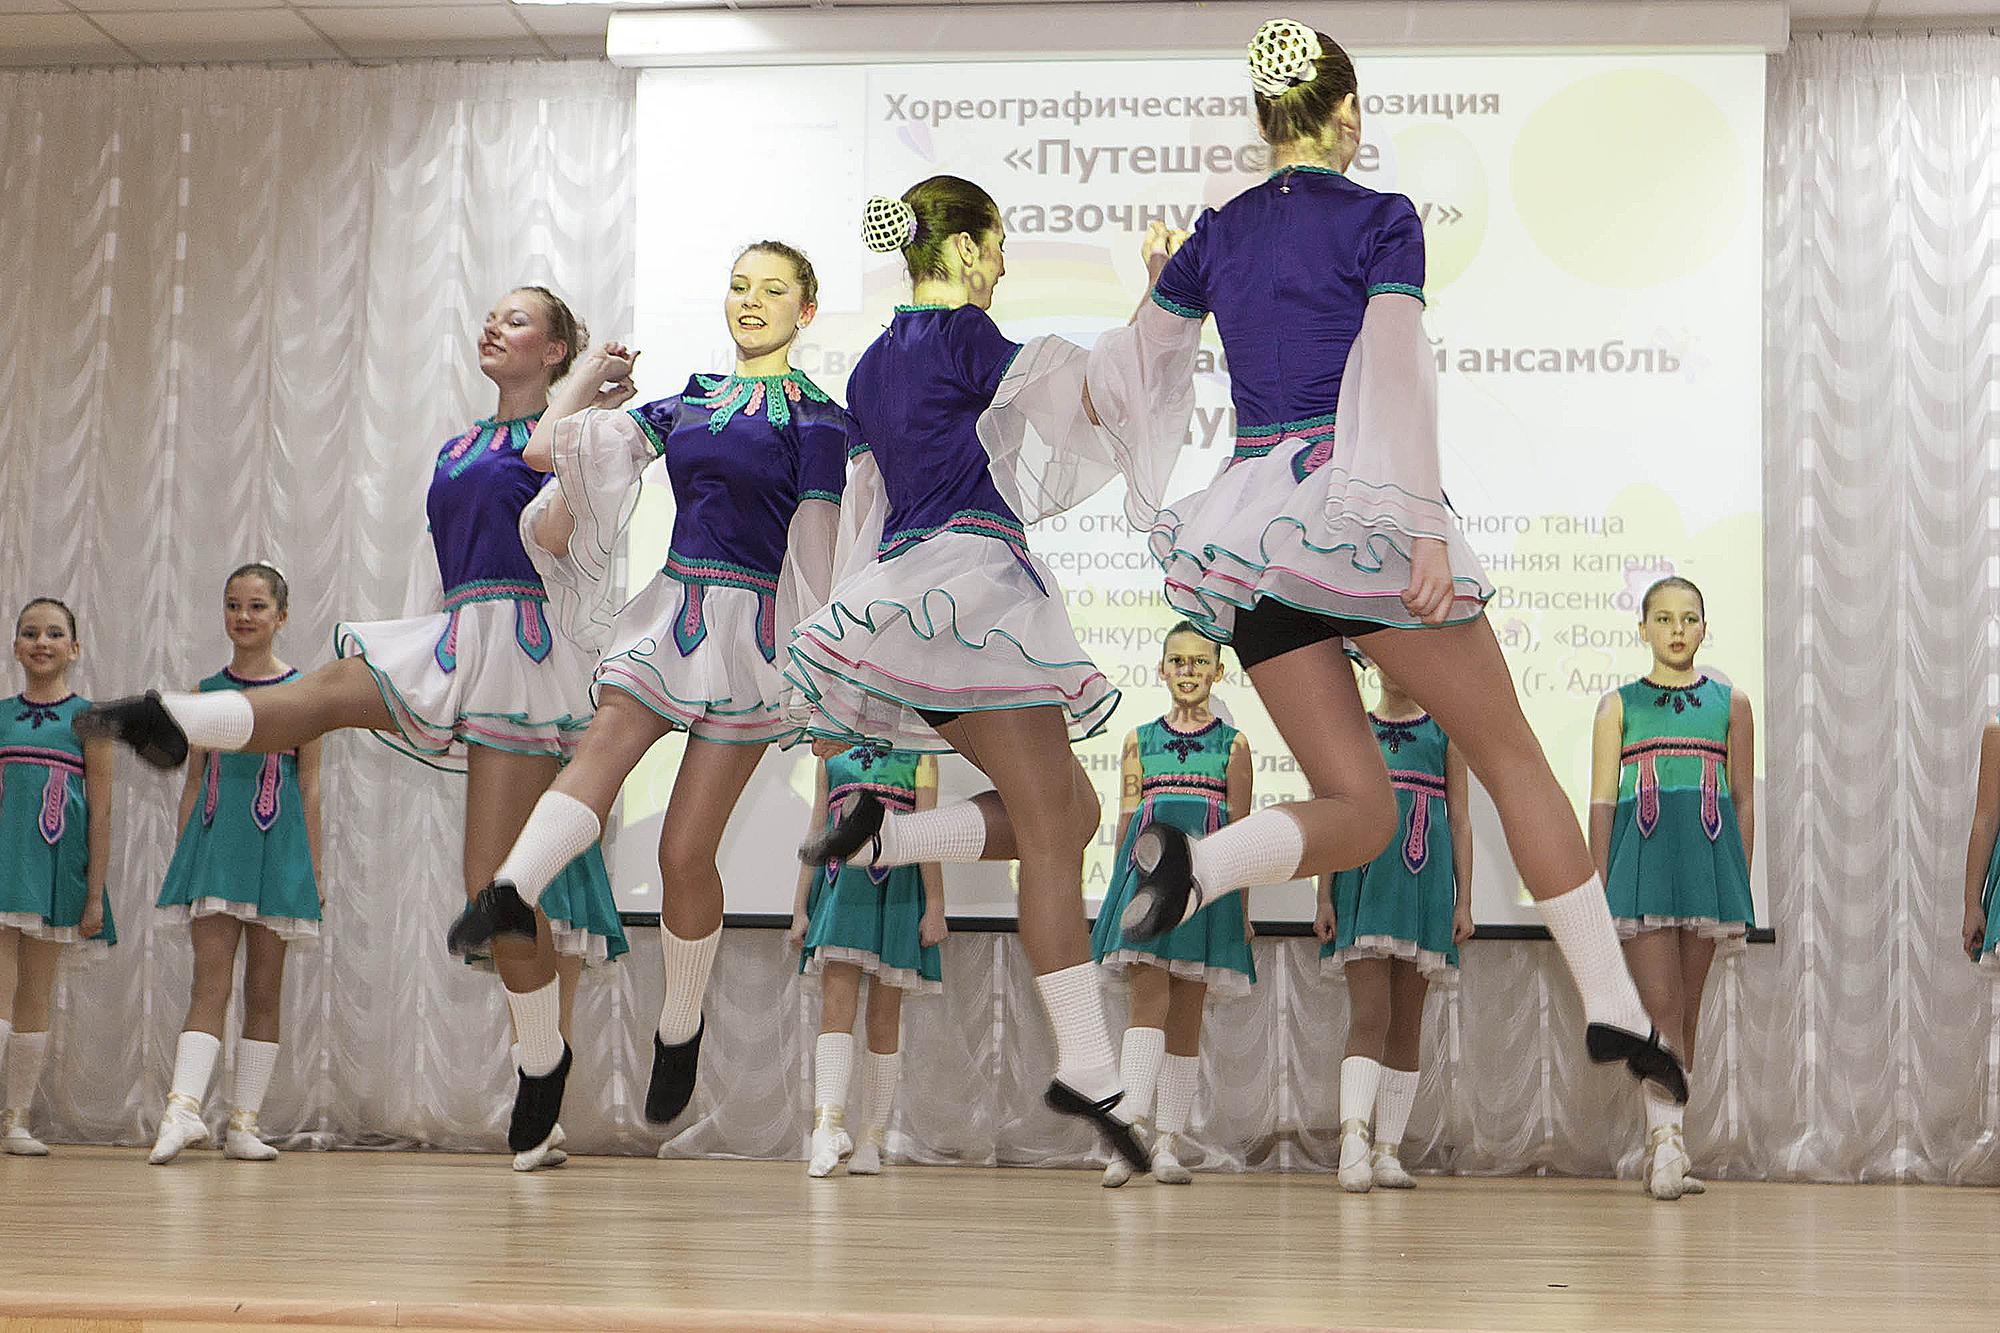 логотип хореографического коллектива фото